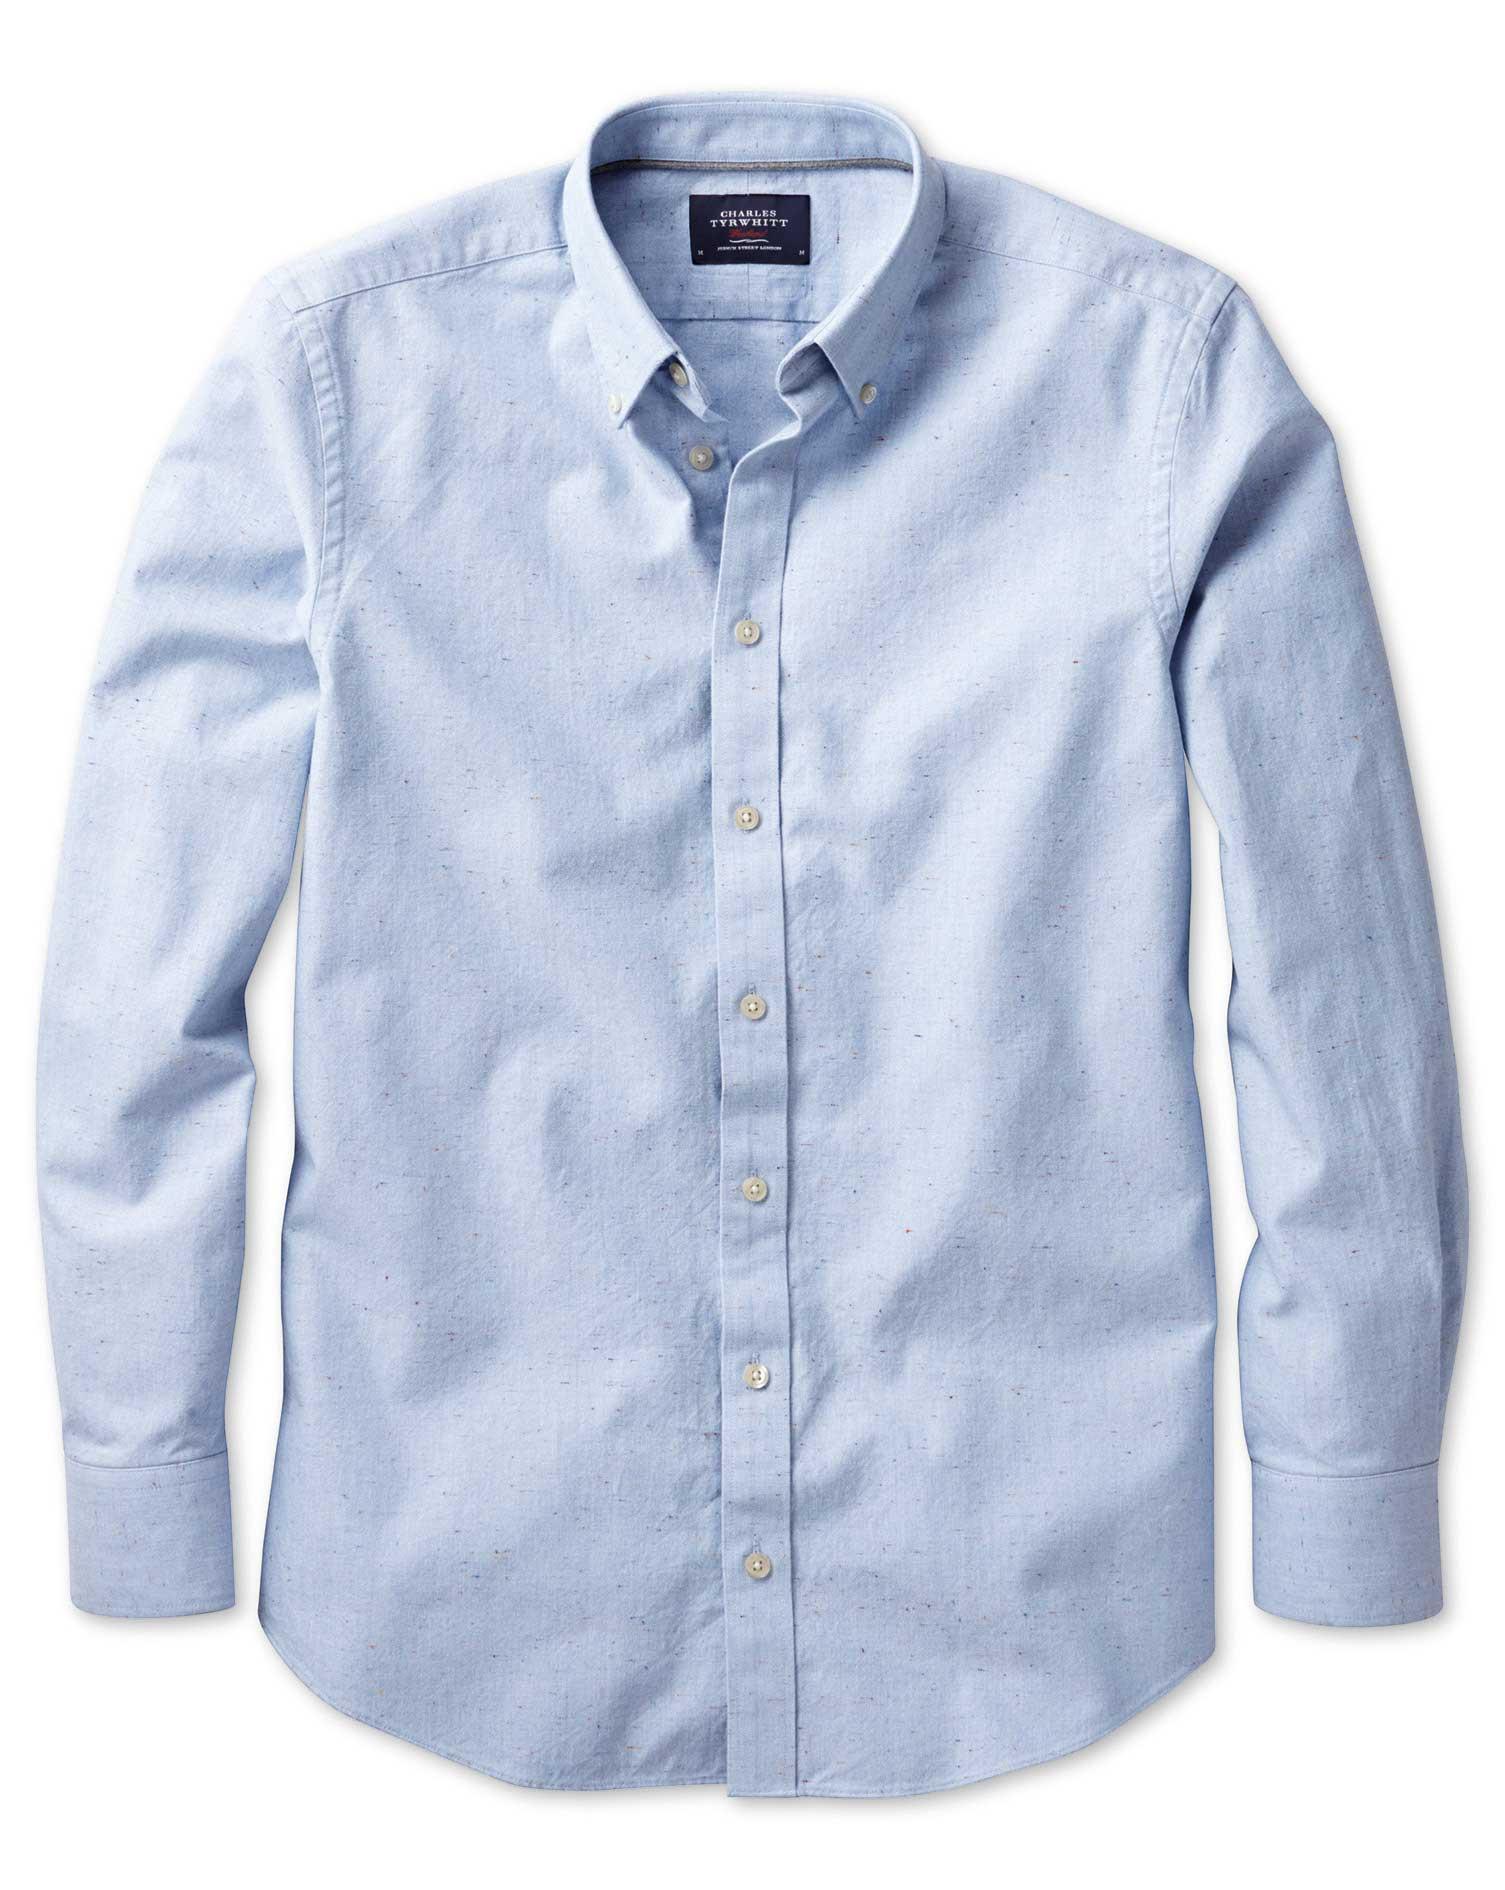 Slim Fit Modern Oxford Sky Blue Fleck Cotton Shirt Single Cuff Size Large by Charles Tyrwhitt